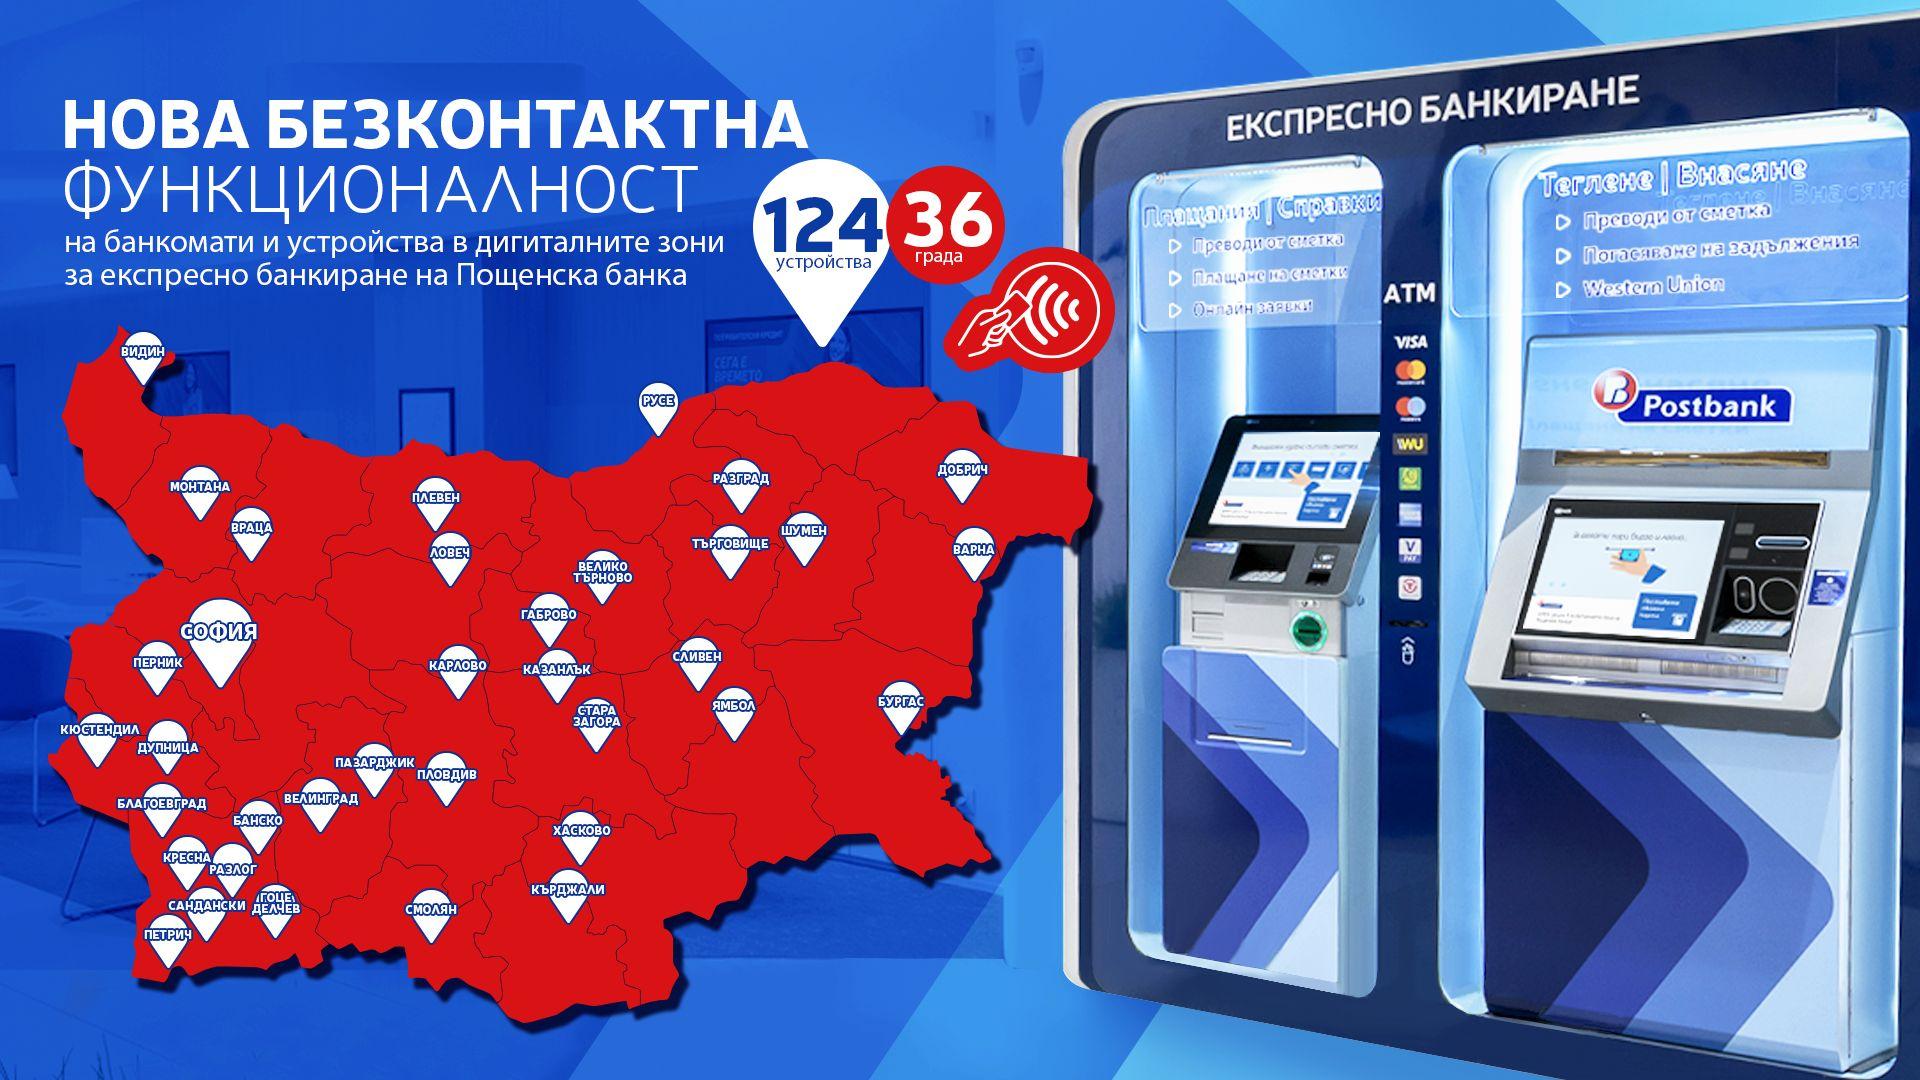 Пощенска банка обяви нови безконтактни услуги - на банкомати и дигиталните зони